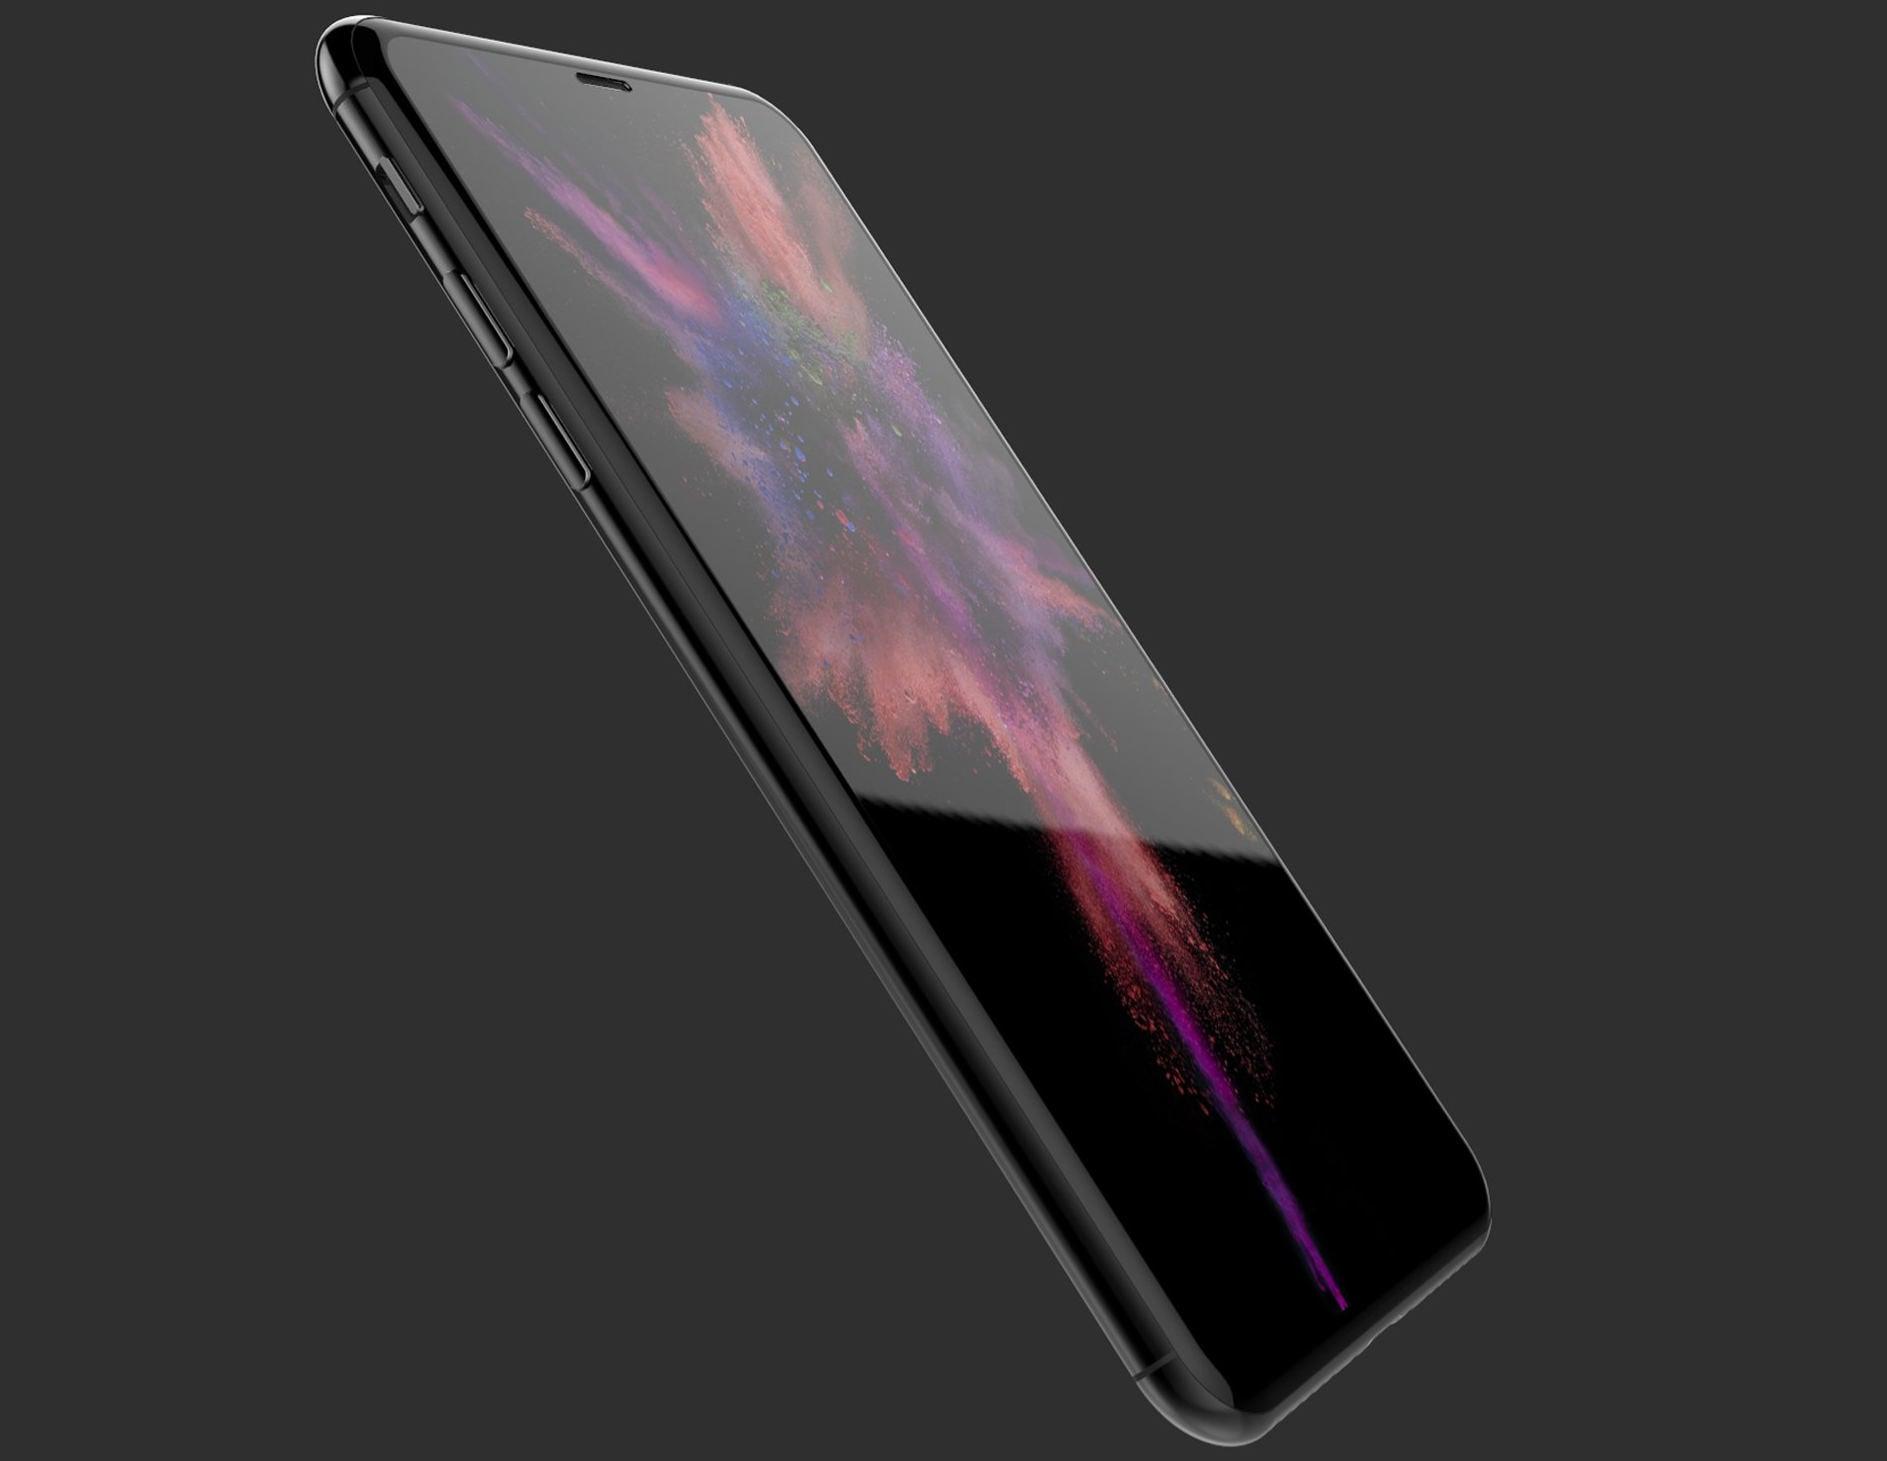 IPhone8 OLEDiPhone 04